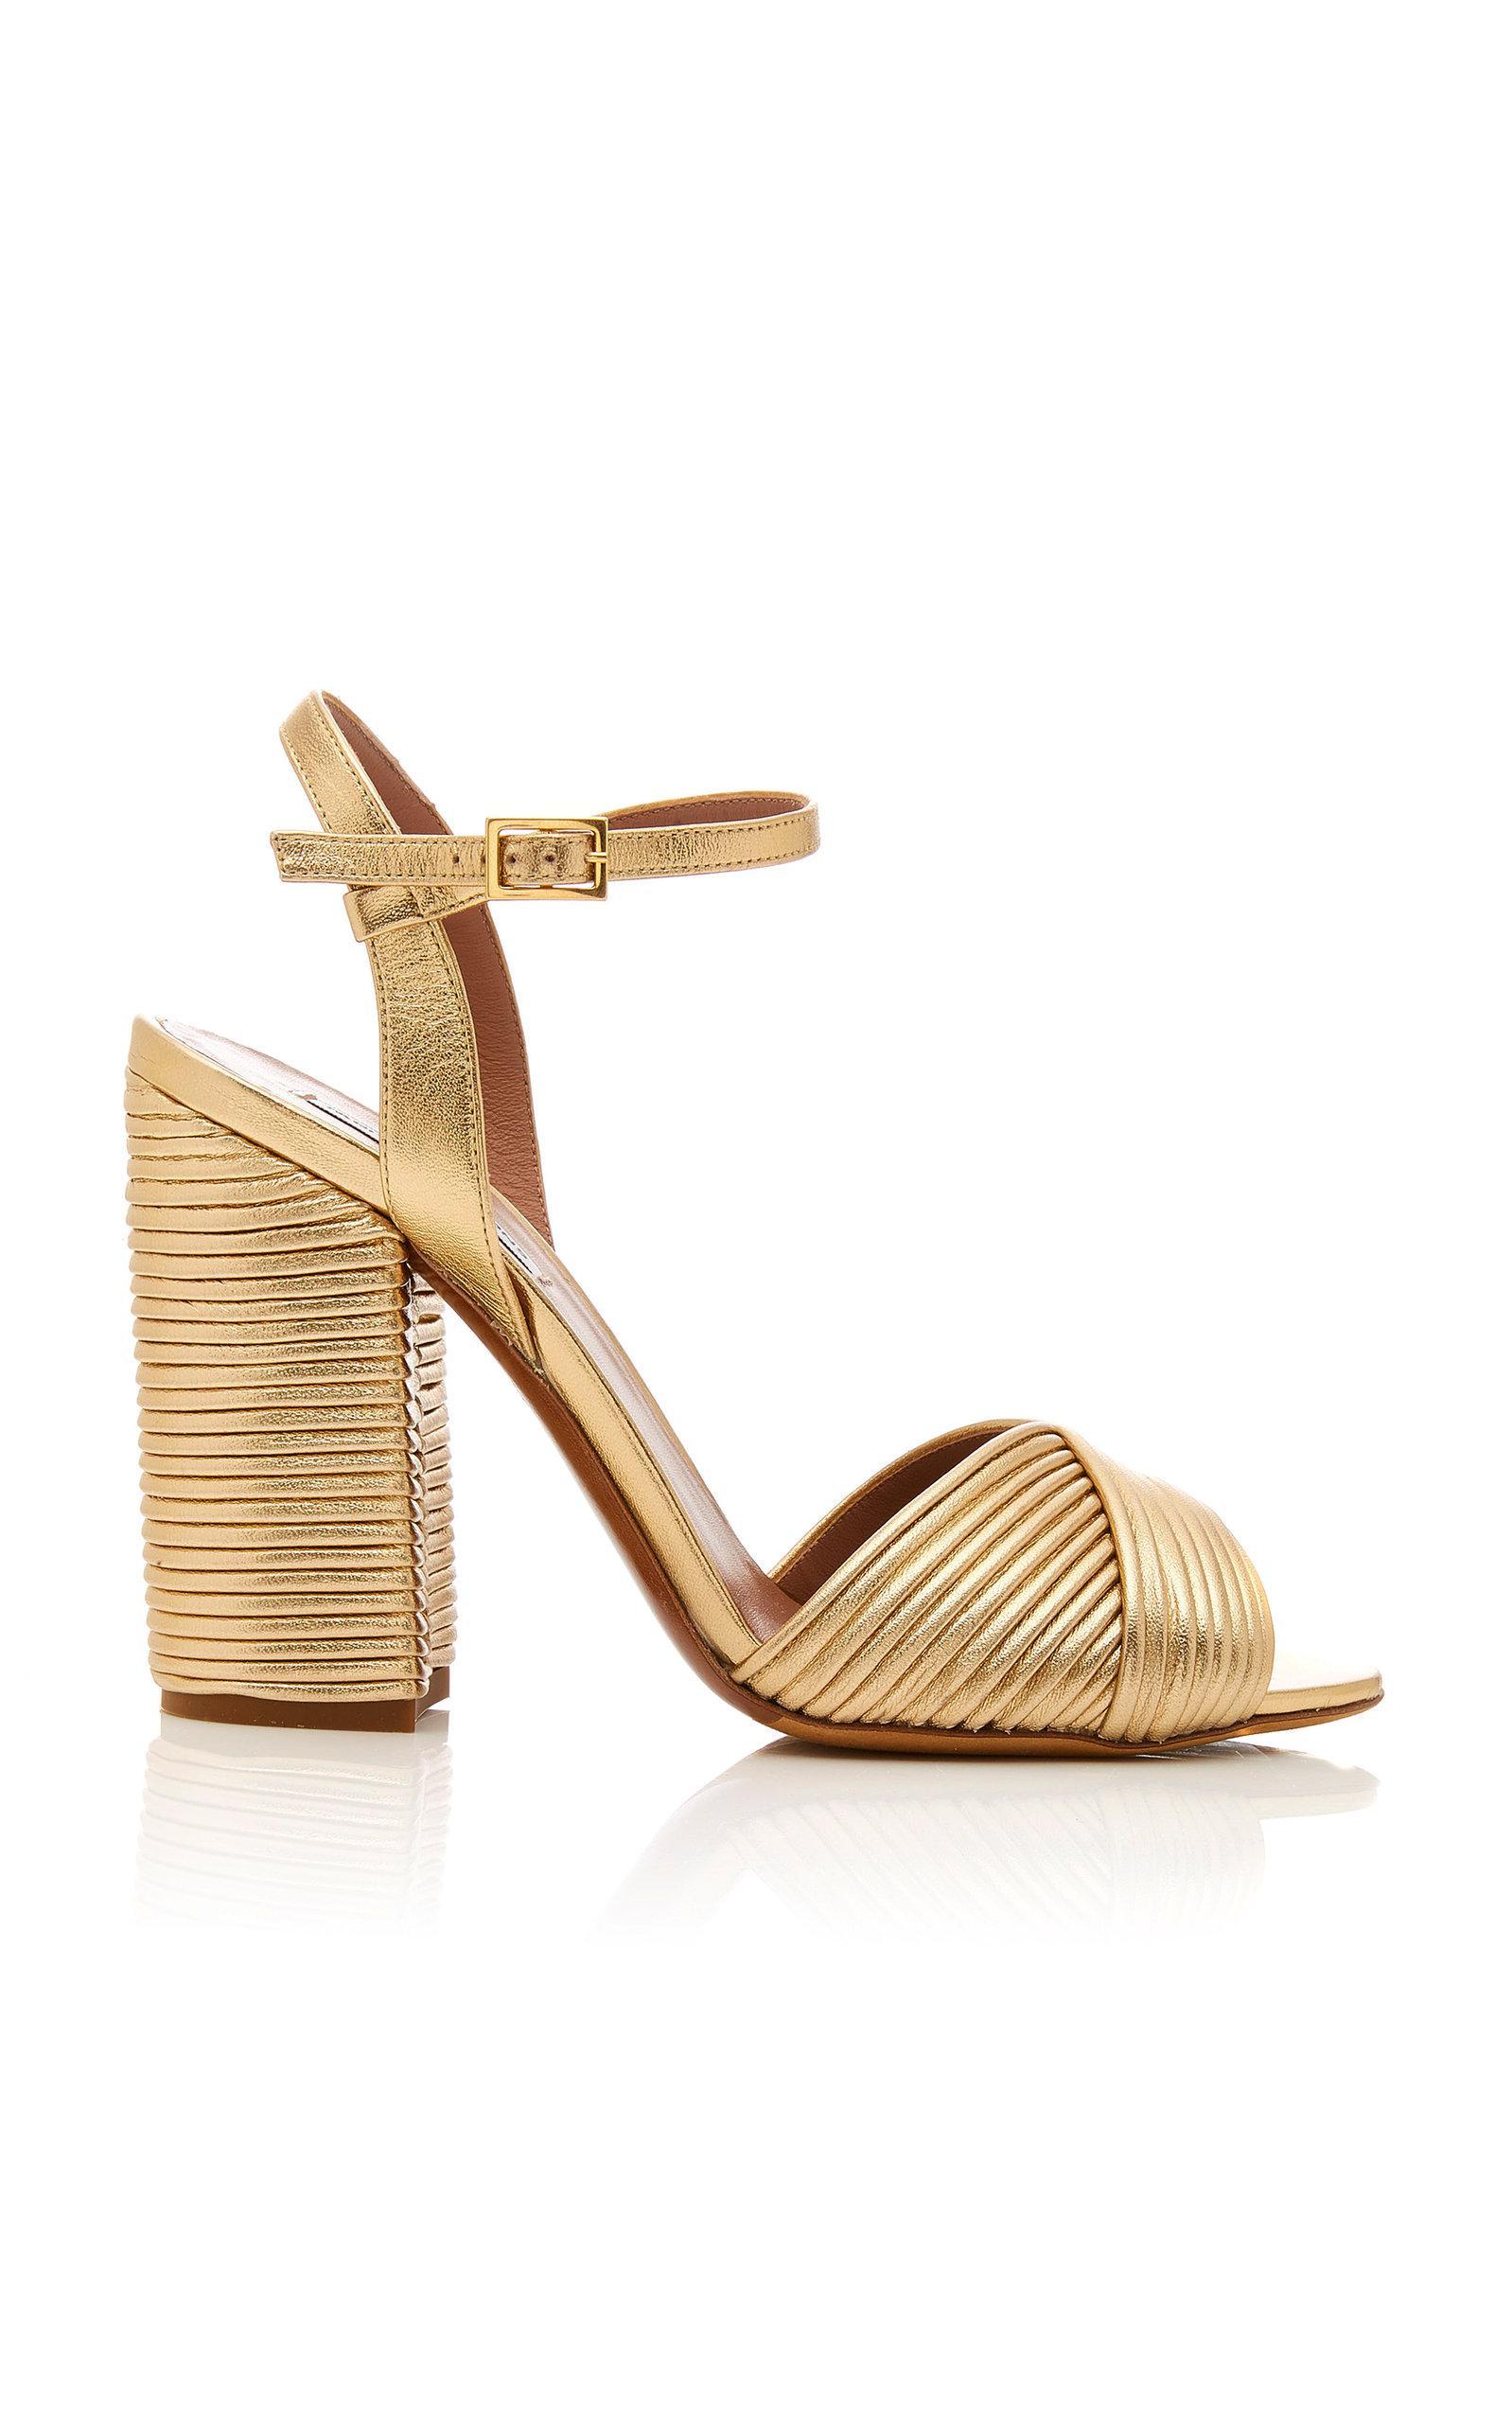 Kali Metallic Leather Sandals Tabitha Simmons Discount Shopping Online 4Gf3Ze8c0